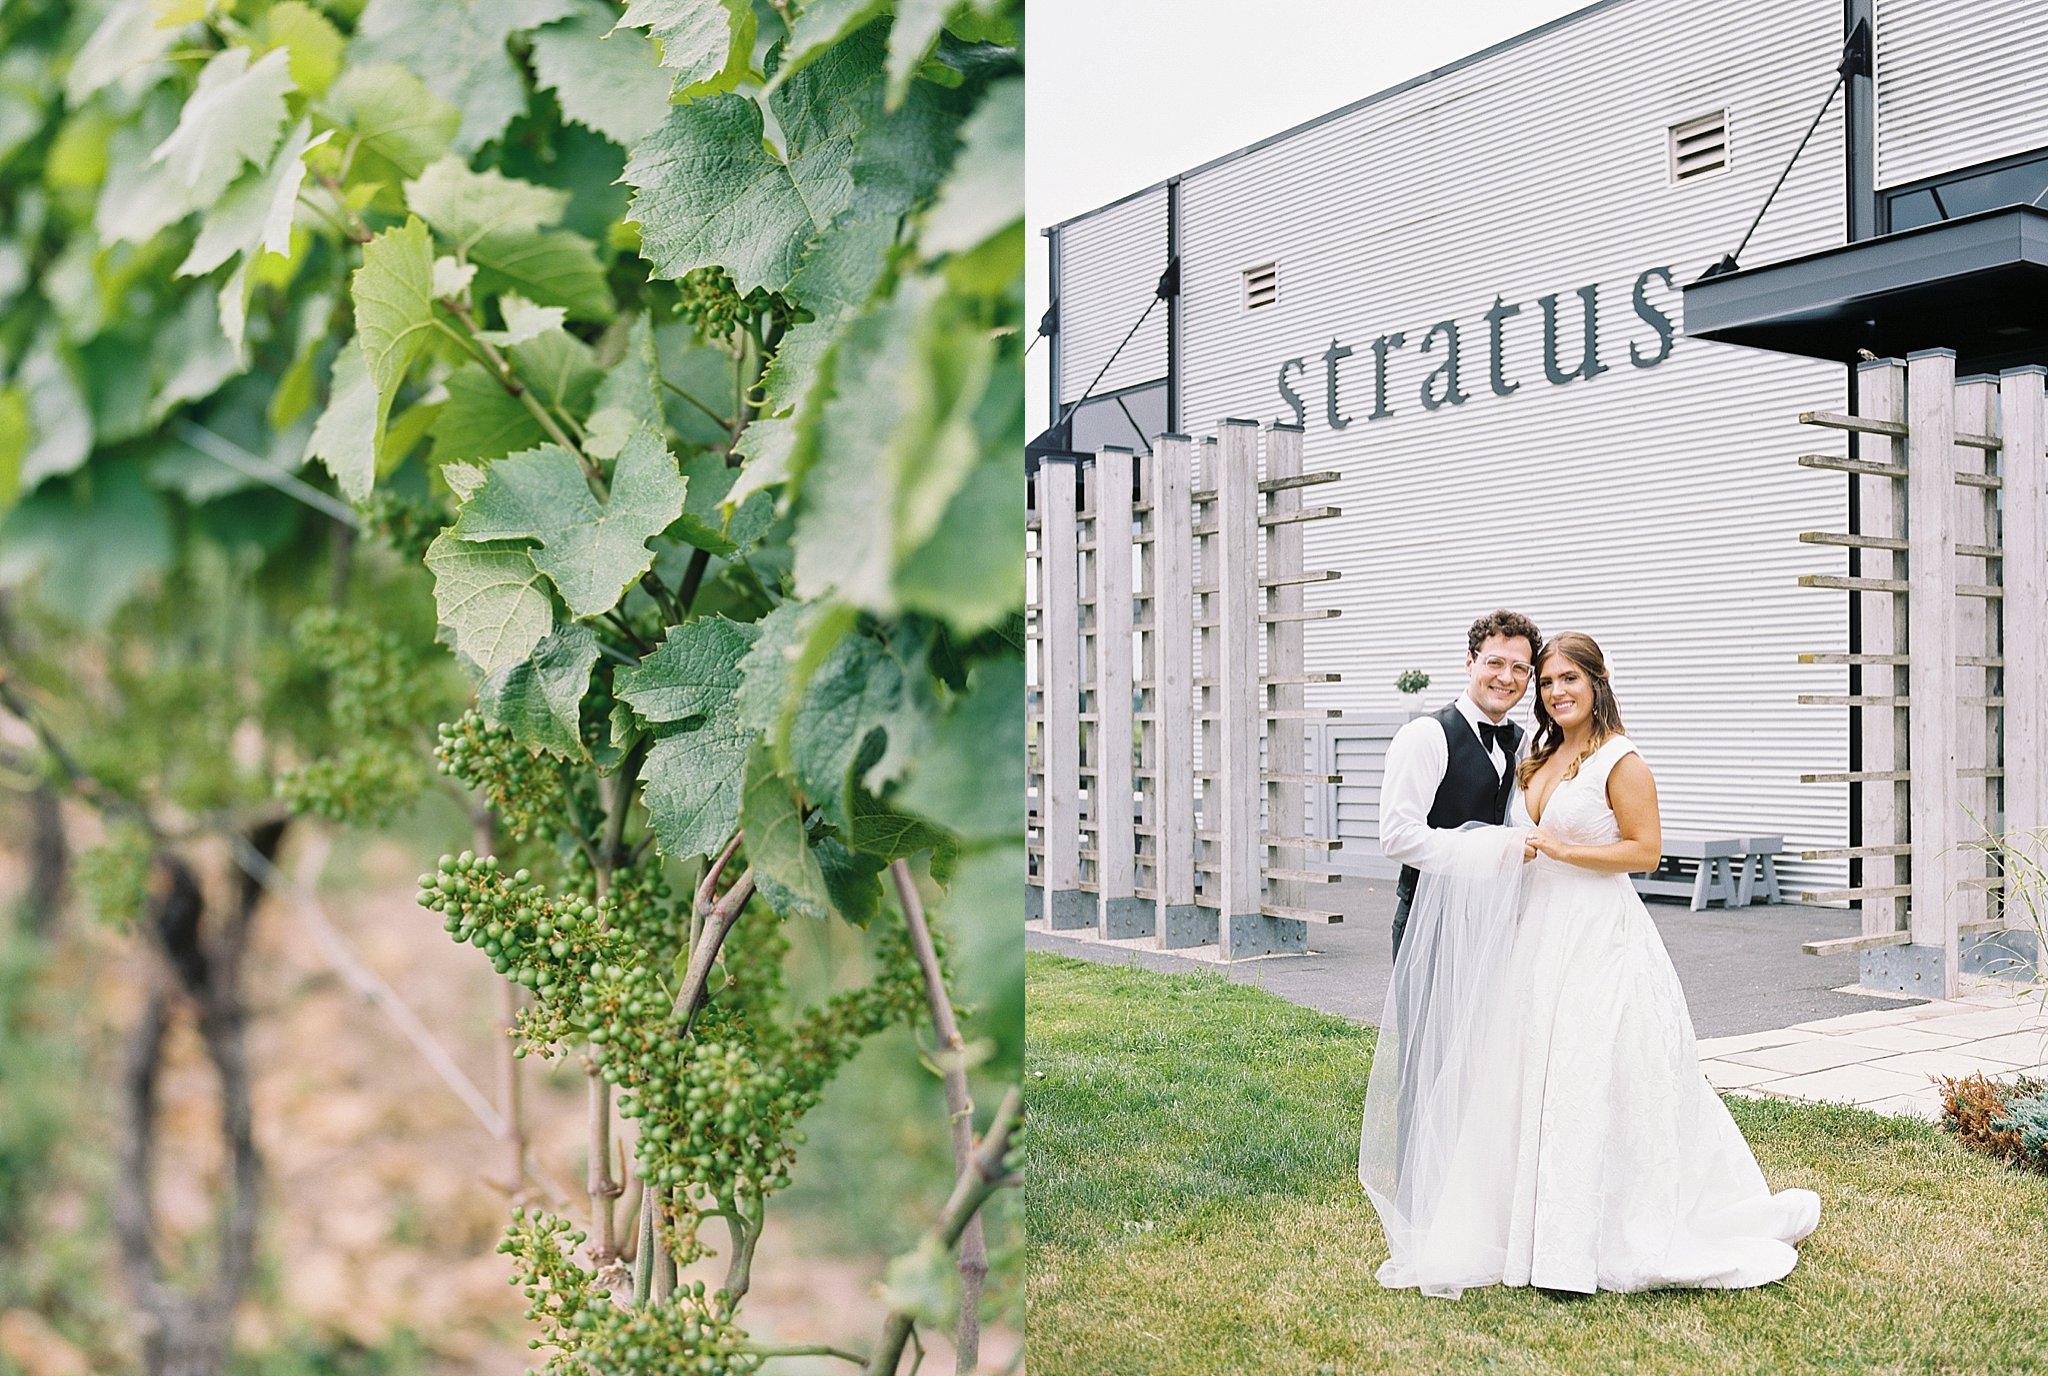 Stratus Winery, Fine art photographer, Durham Region Wedding Photography